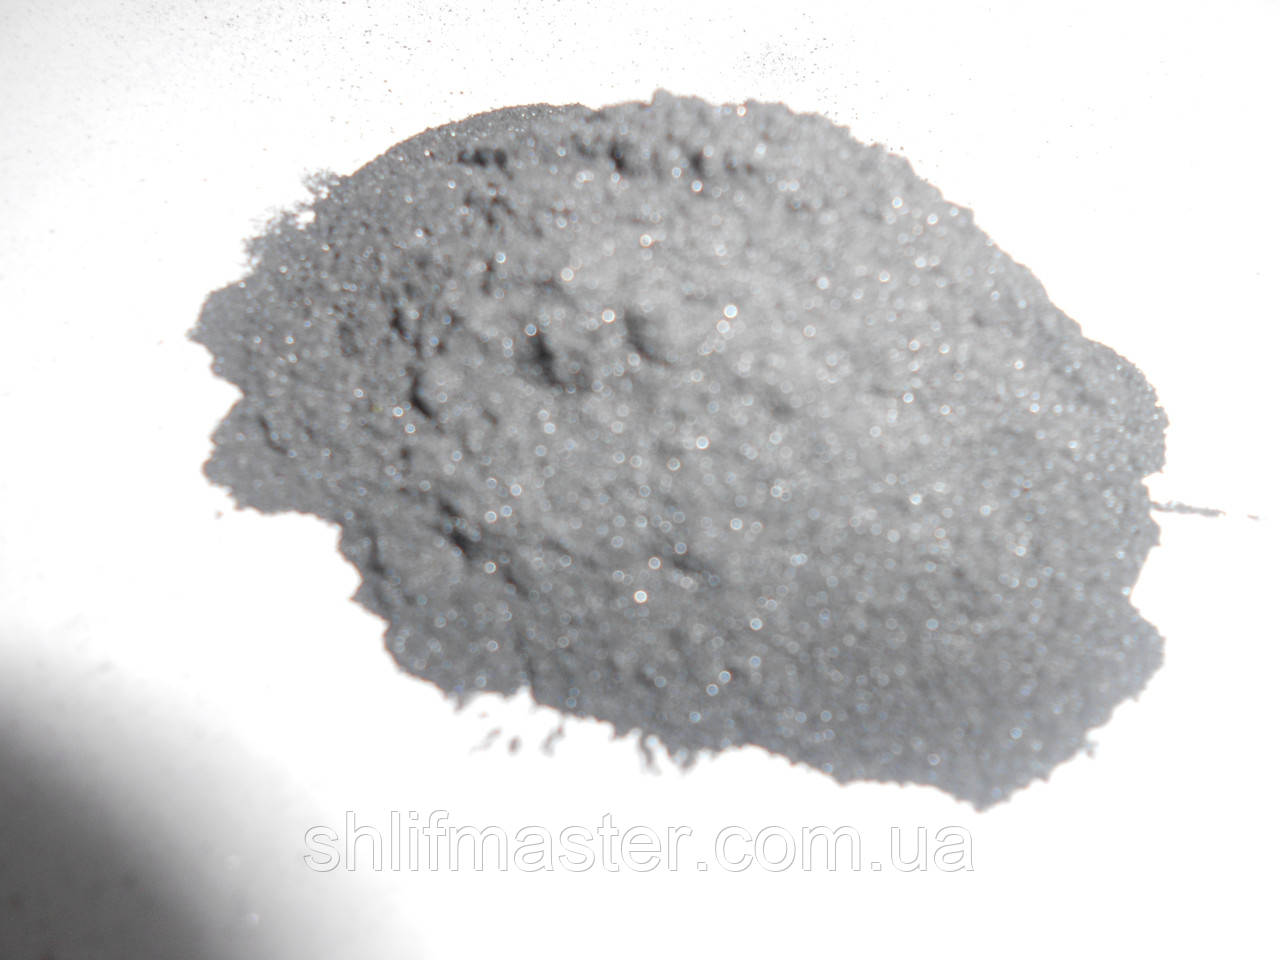 Шлифзерно карбида кремния черного 54С  F60 / 25